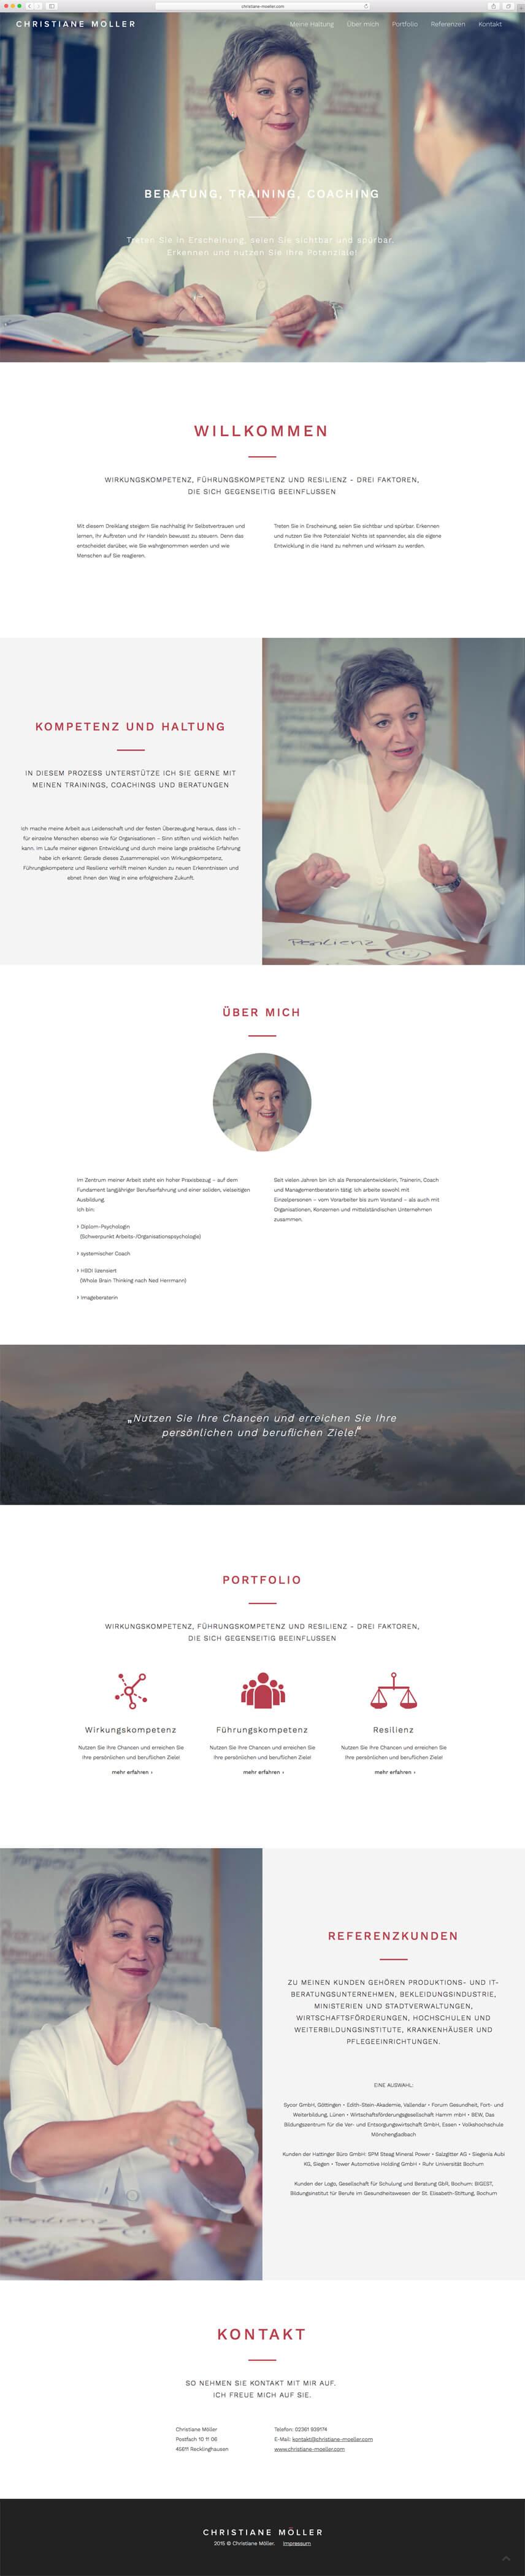 websites_portfolio_christiane_moeller_856